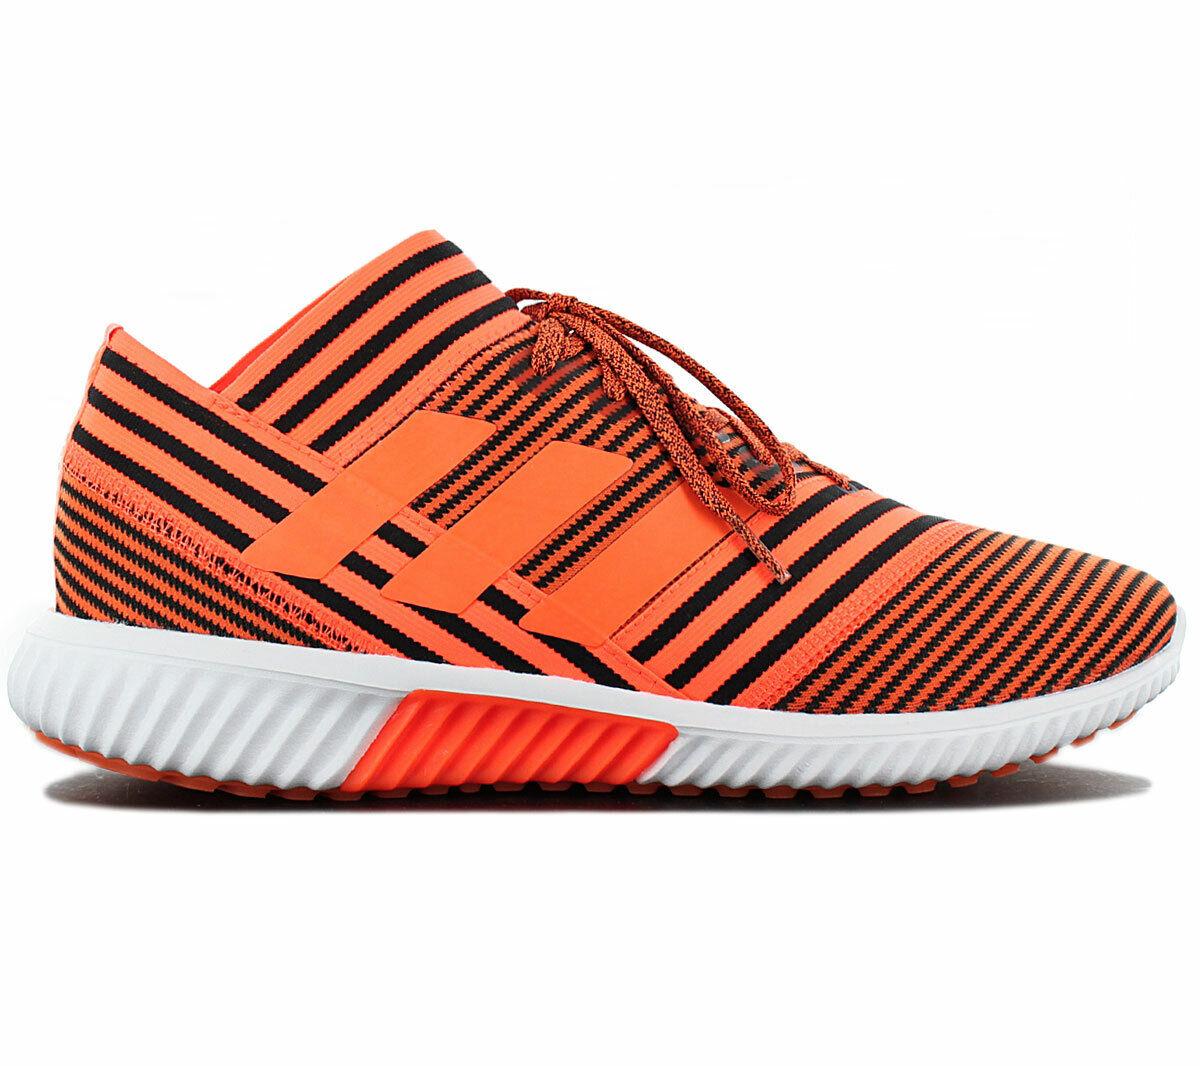 Adidas Adidas Adidas Nemeziz Tango 17.1 TR Herren Schuhe BY2464 Street Soccer Fußball Orange 05f425